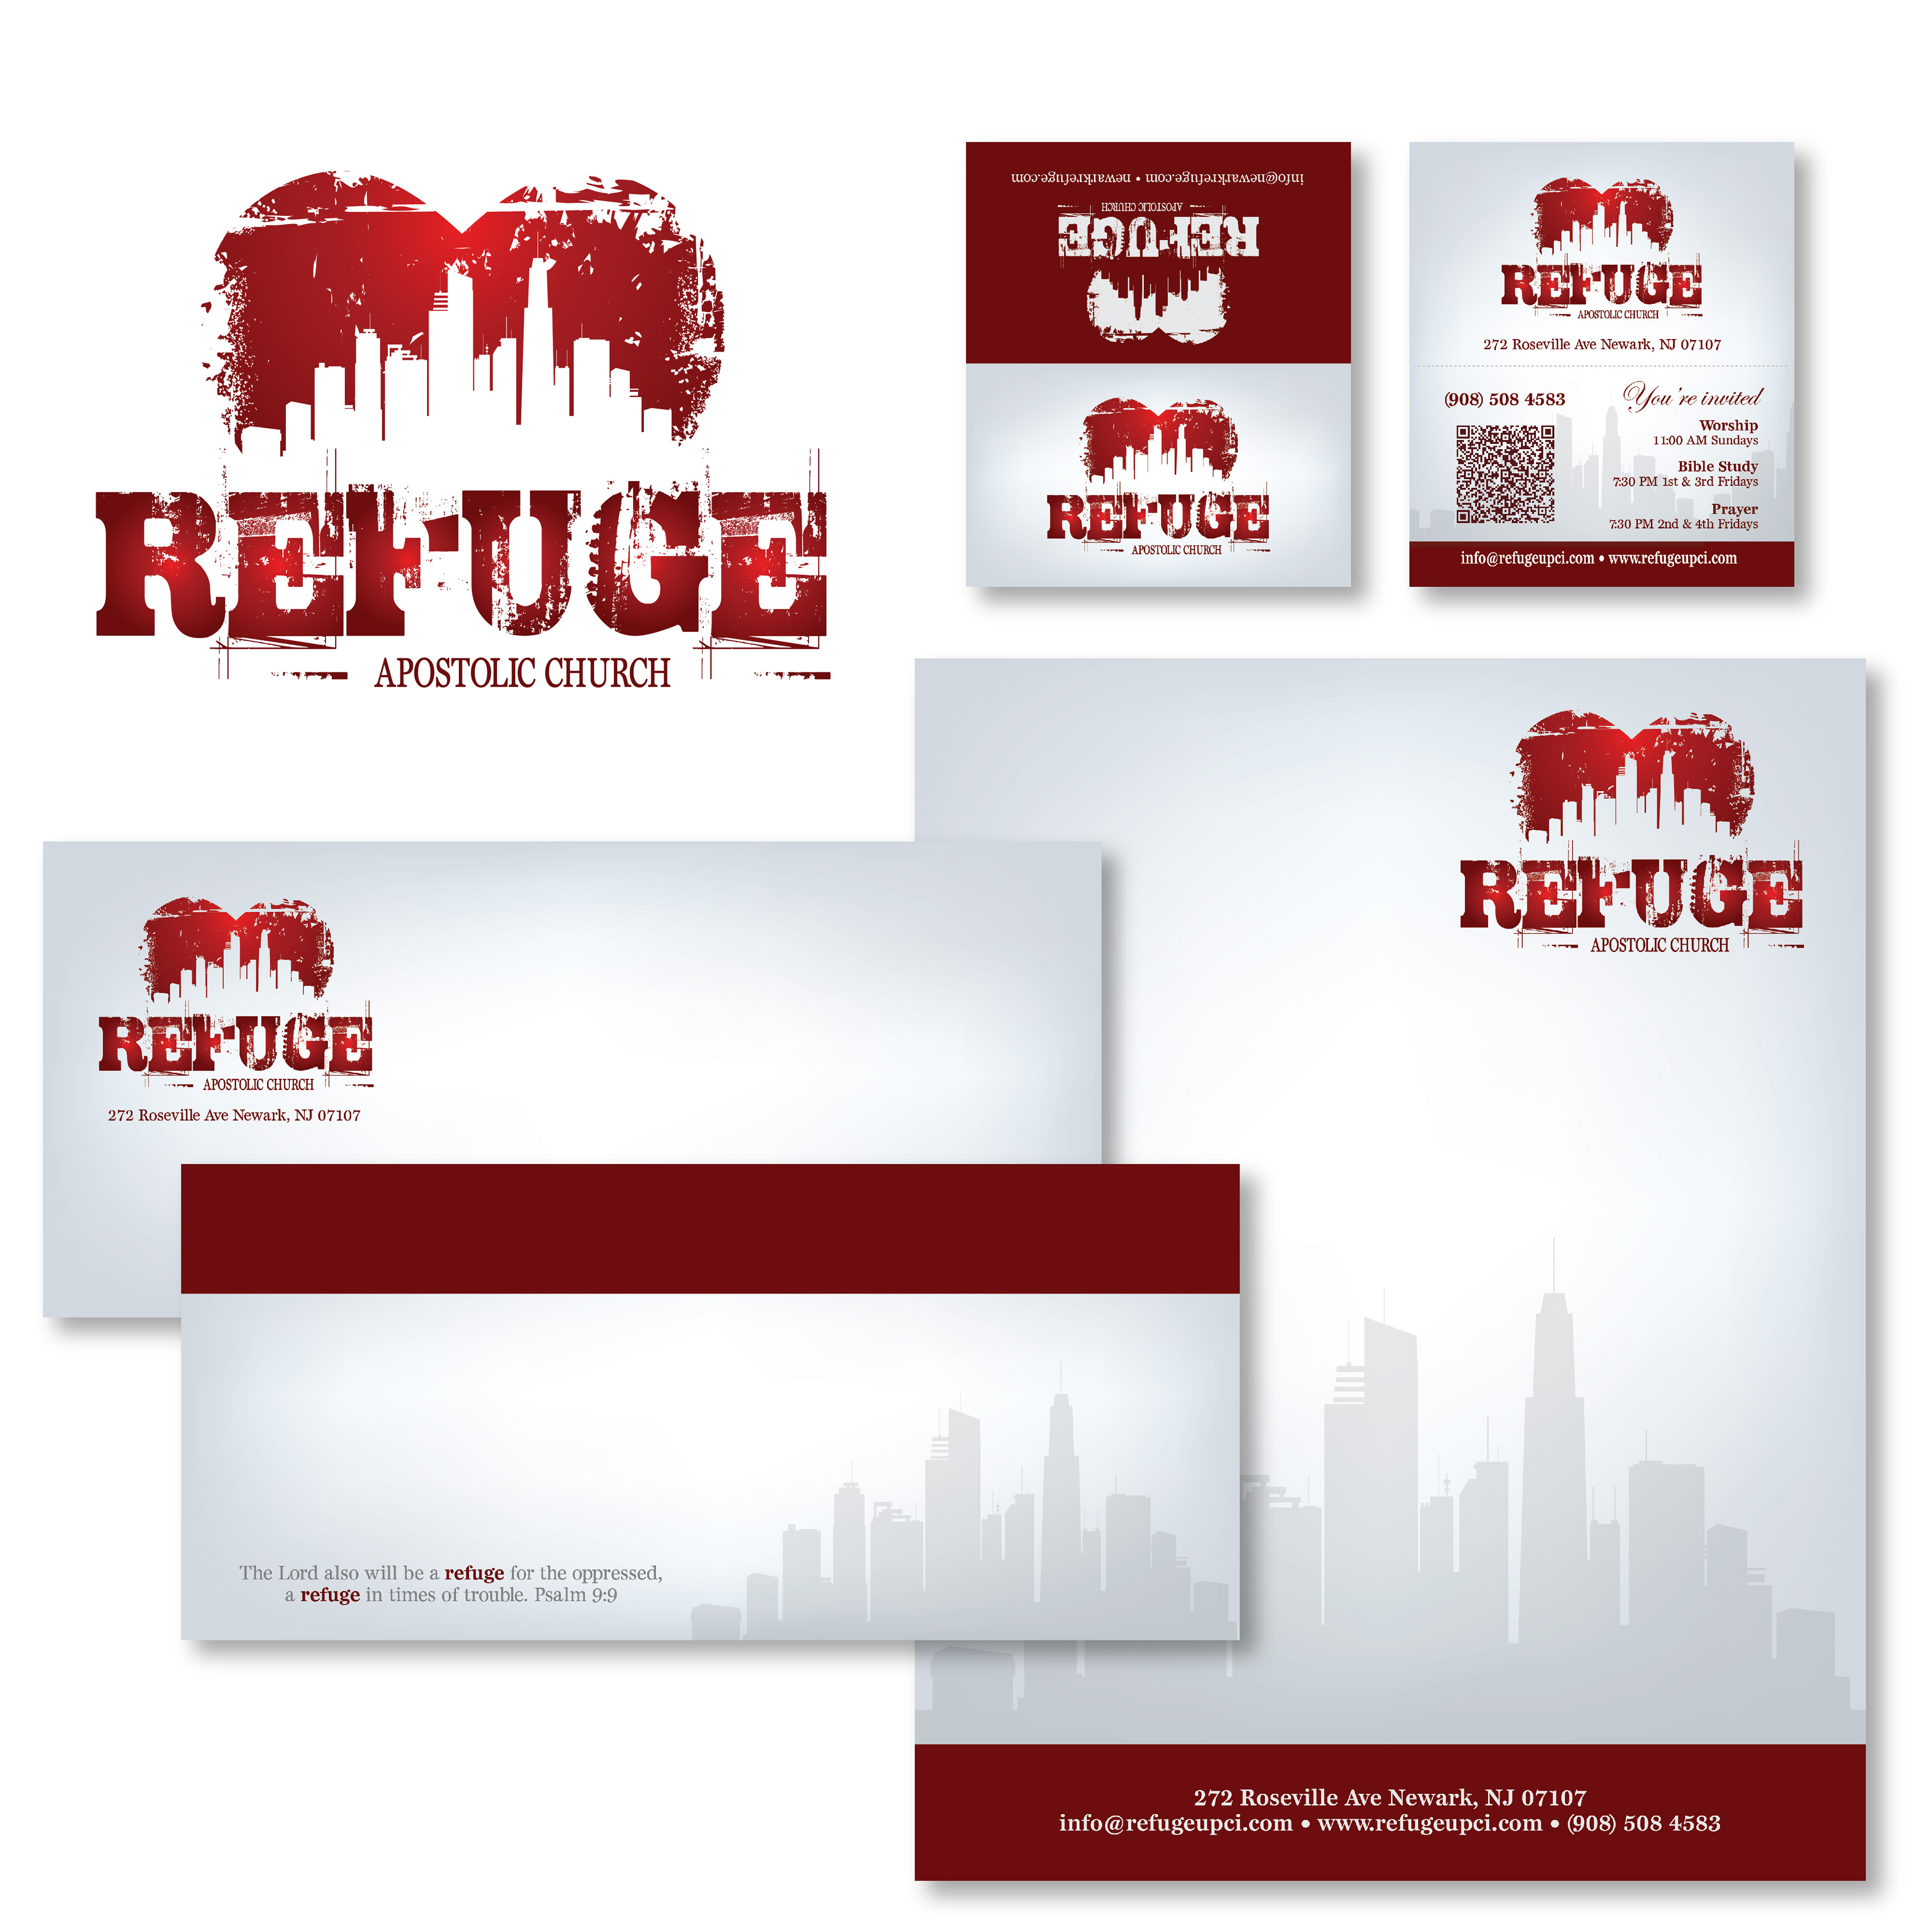 Designs by kim ferguson graphic design brand management web designs by kim ferguson graphic design brand management web design refuge apostolic church newark nj reheart Images